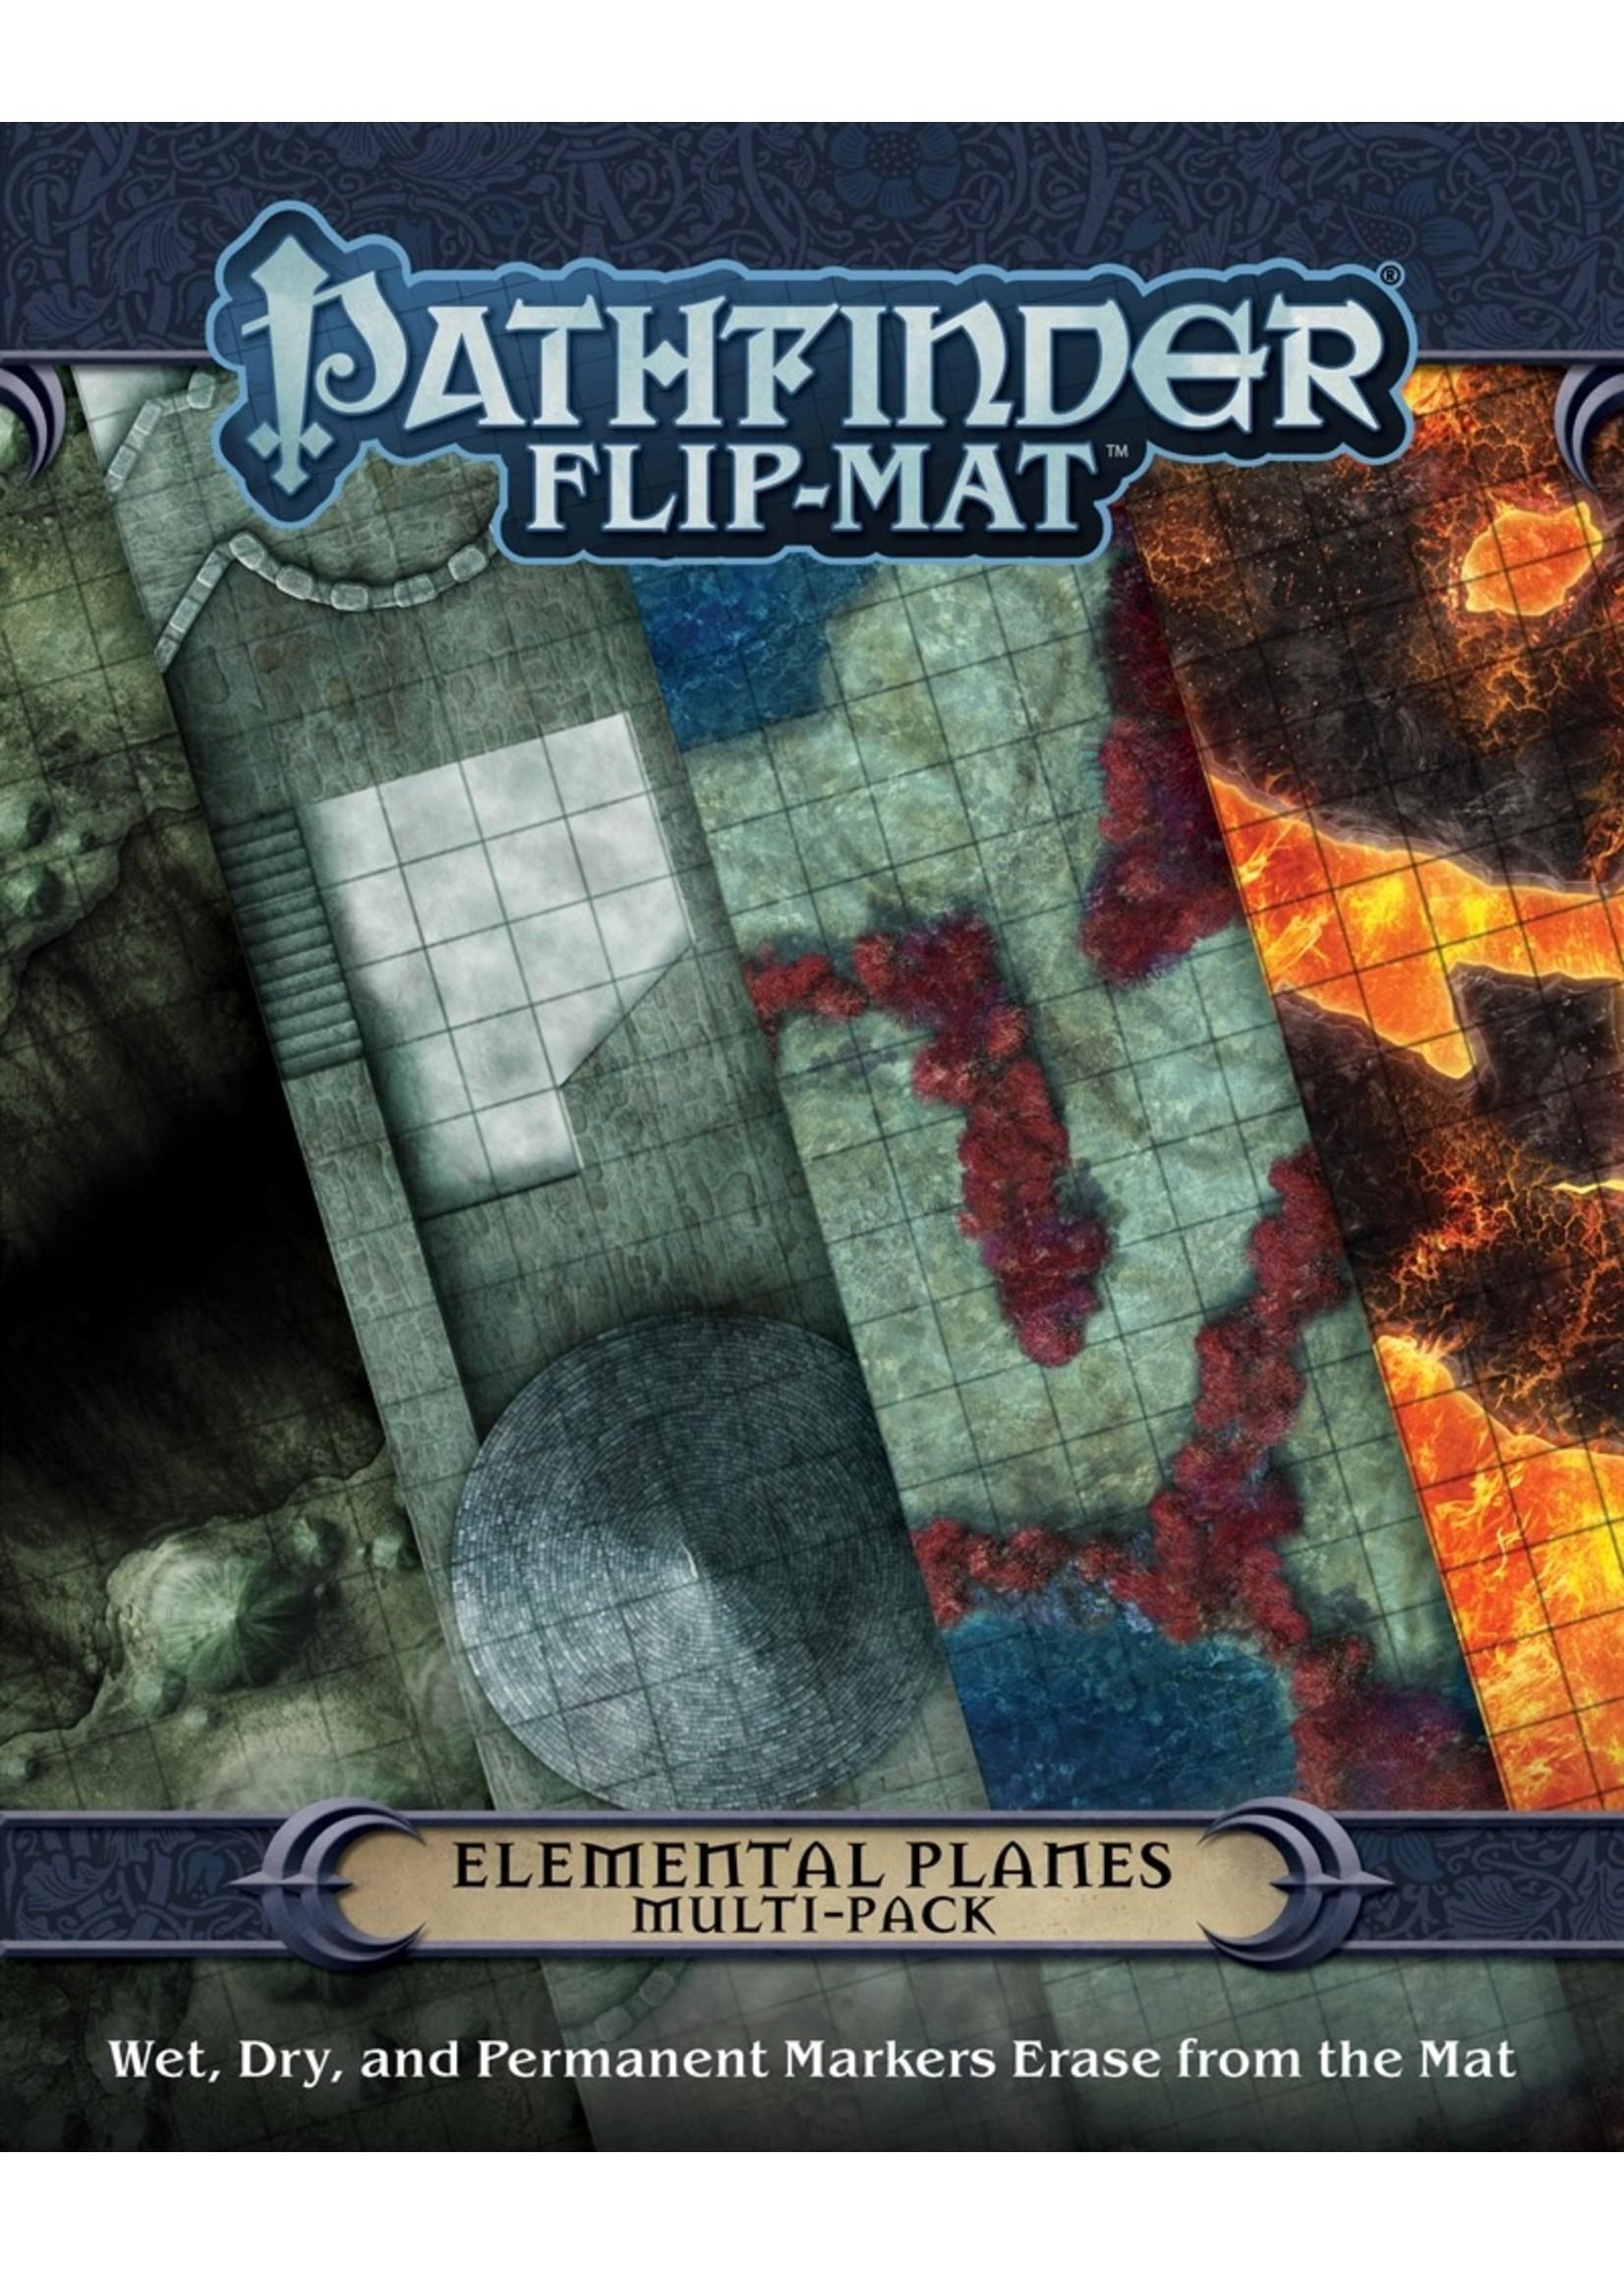 Pathfinder RPG: Flip-Mat - Elemental Planes Multi-Pack